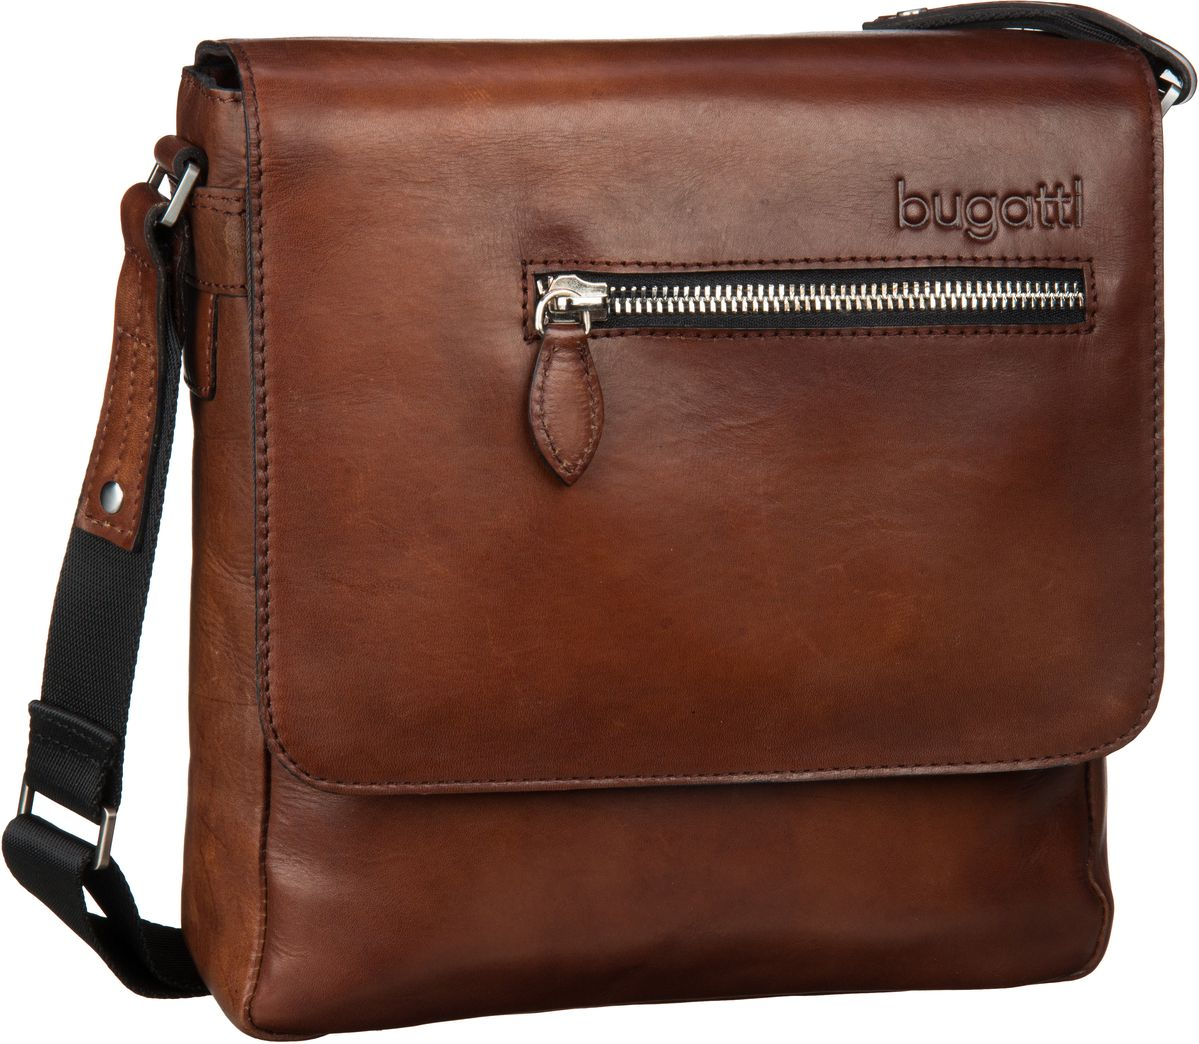 bugatti -  Laptoptasche Domus Shoulder Bag Medium Cognac